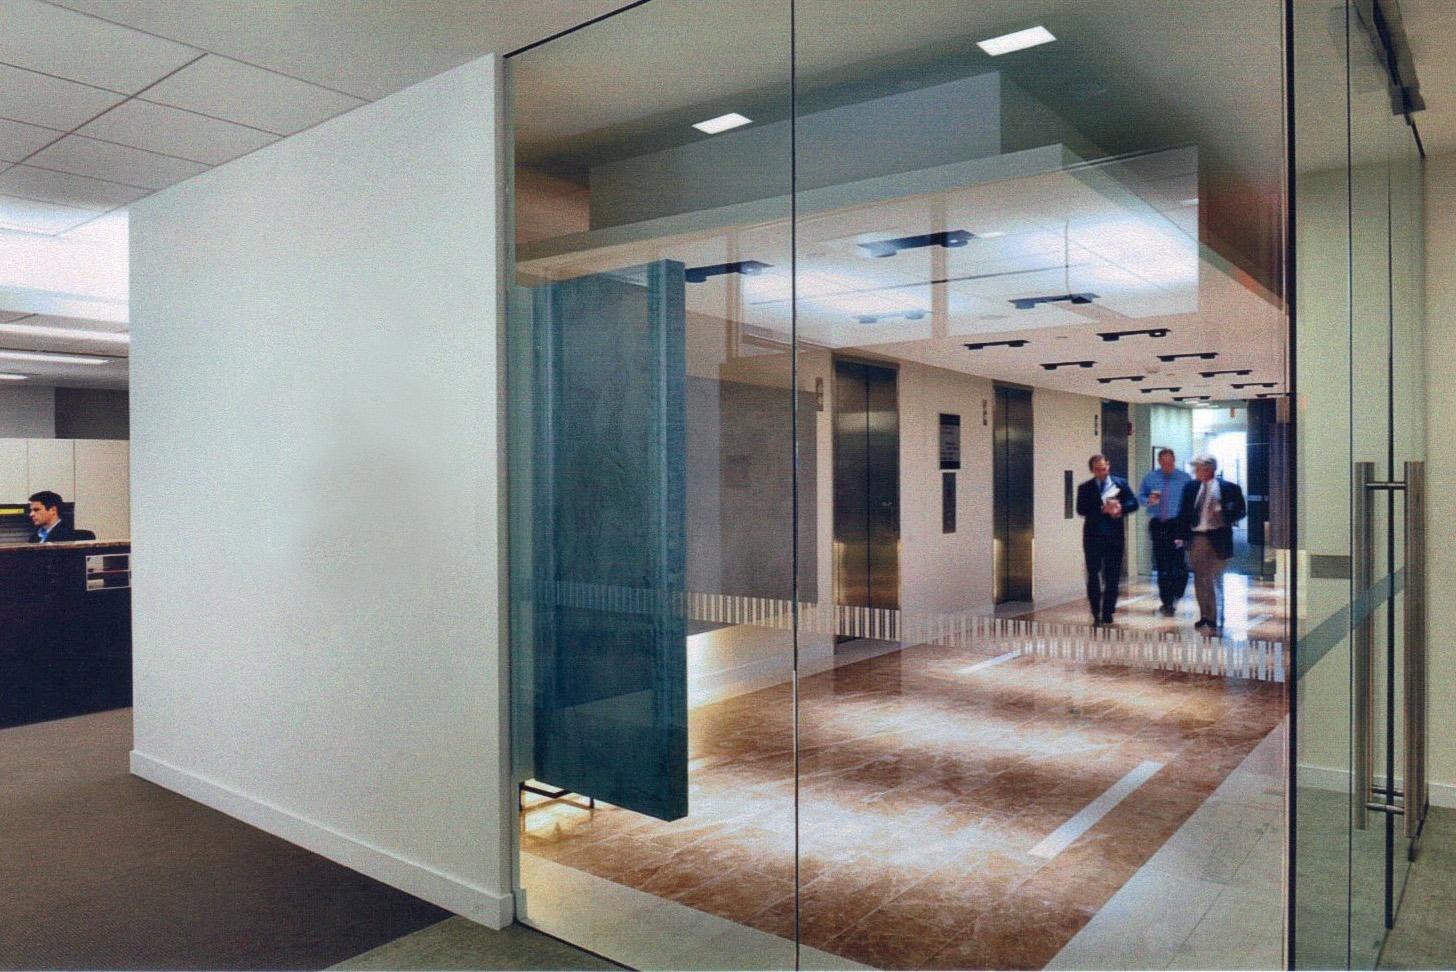 Lobby with People.jpg